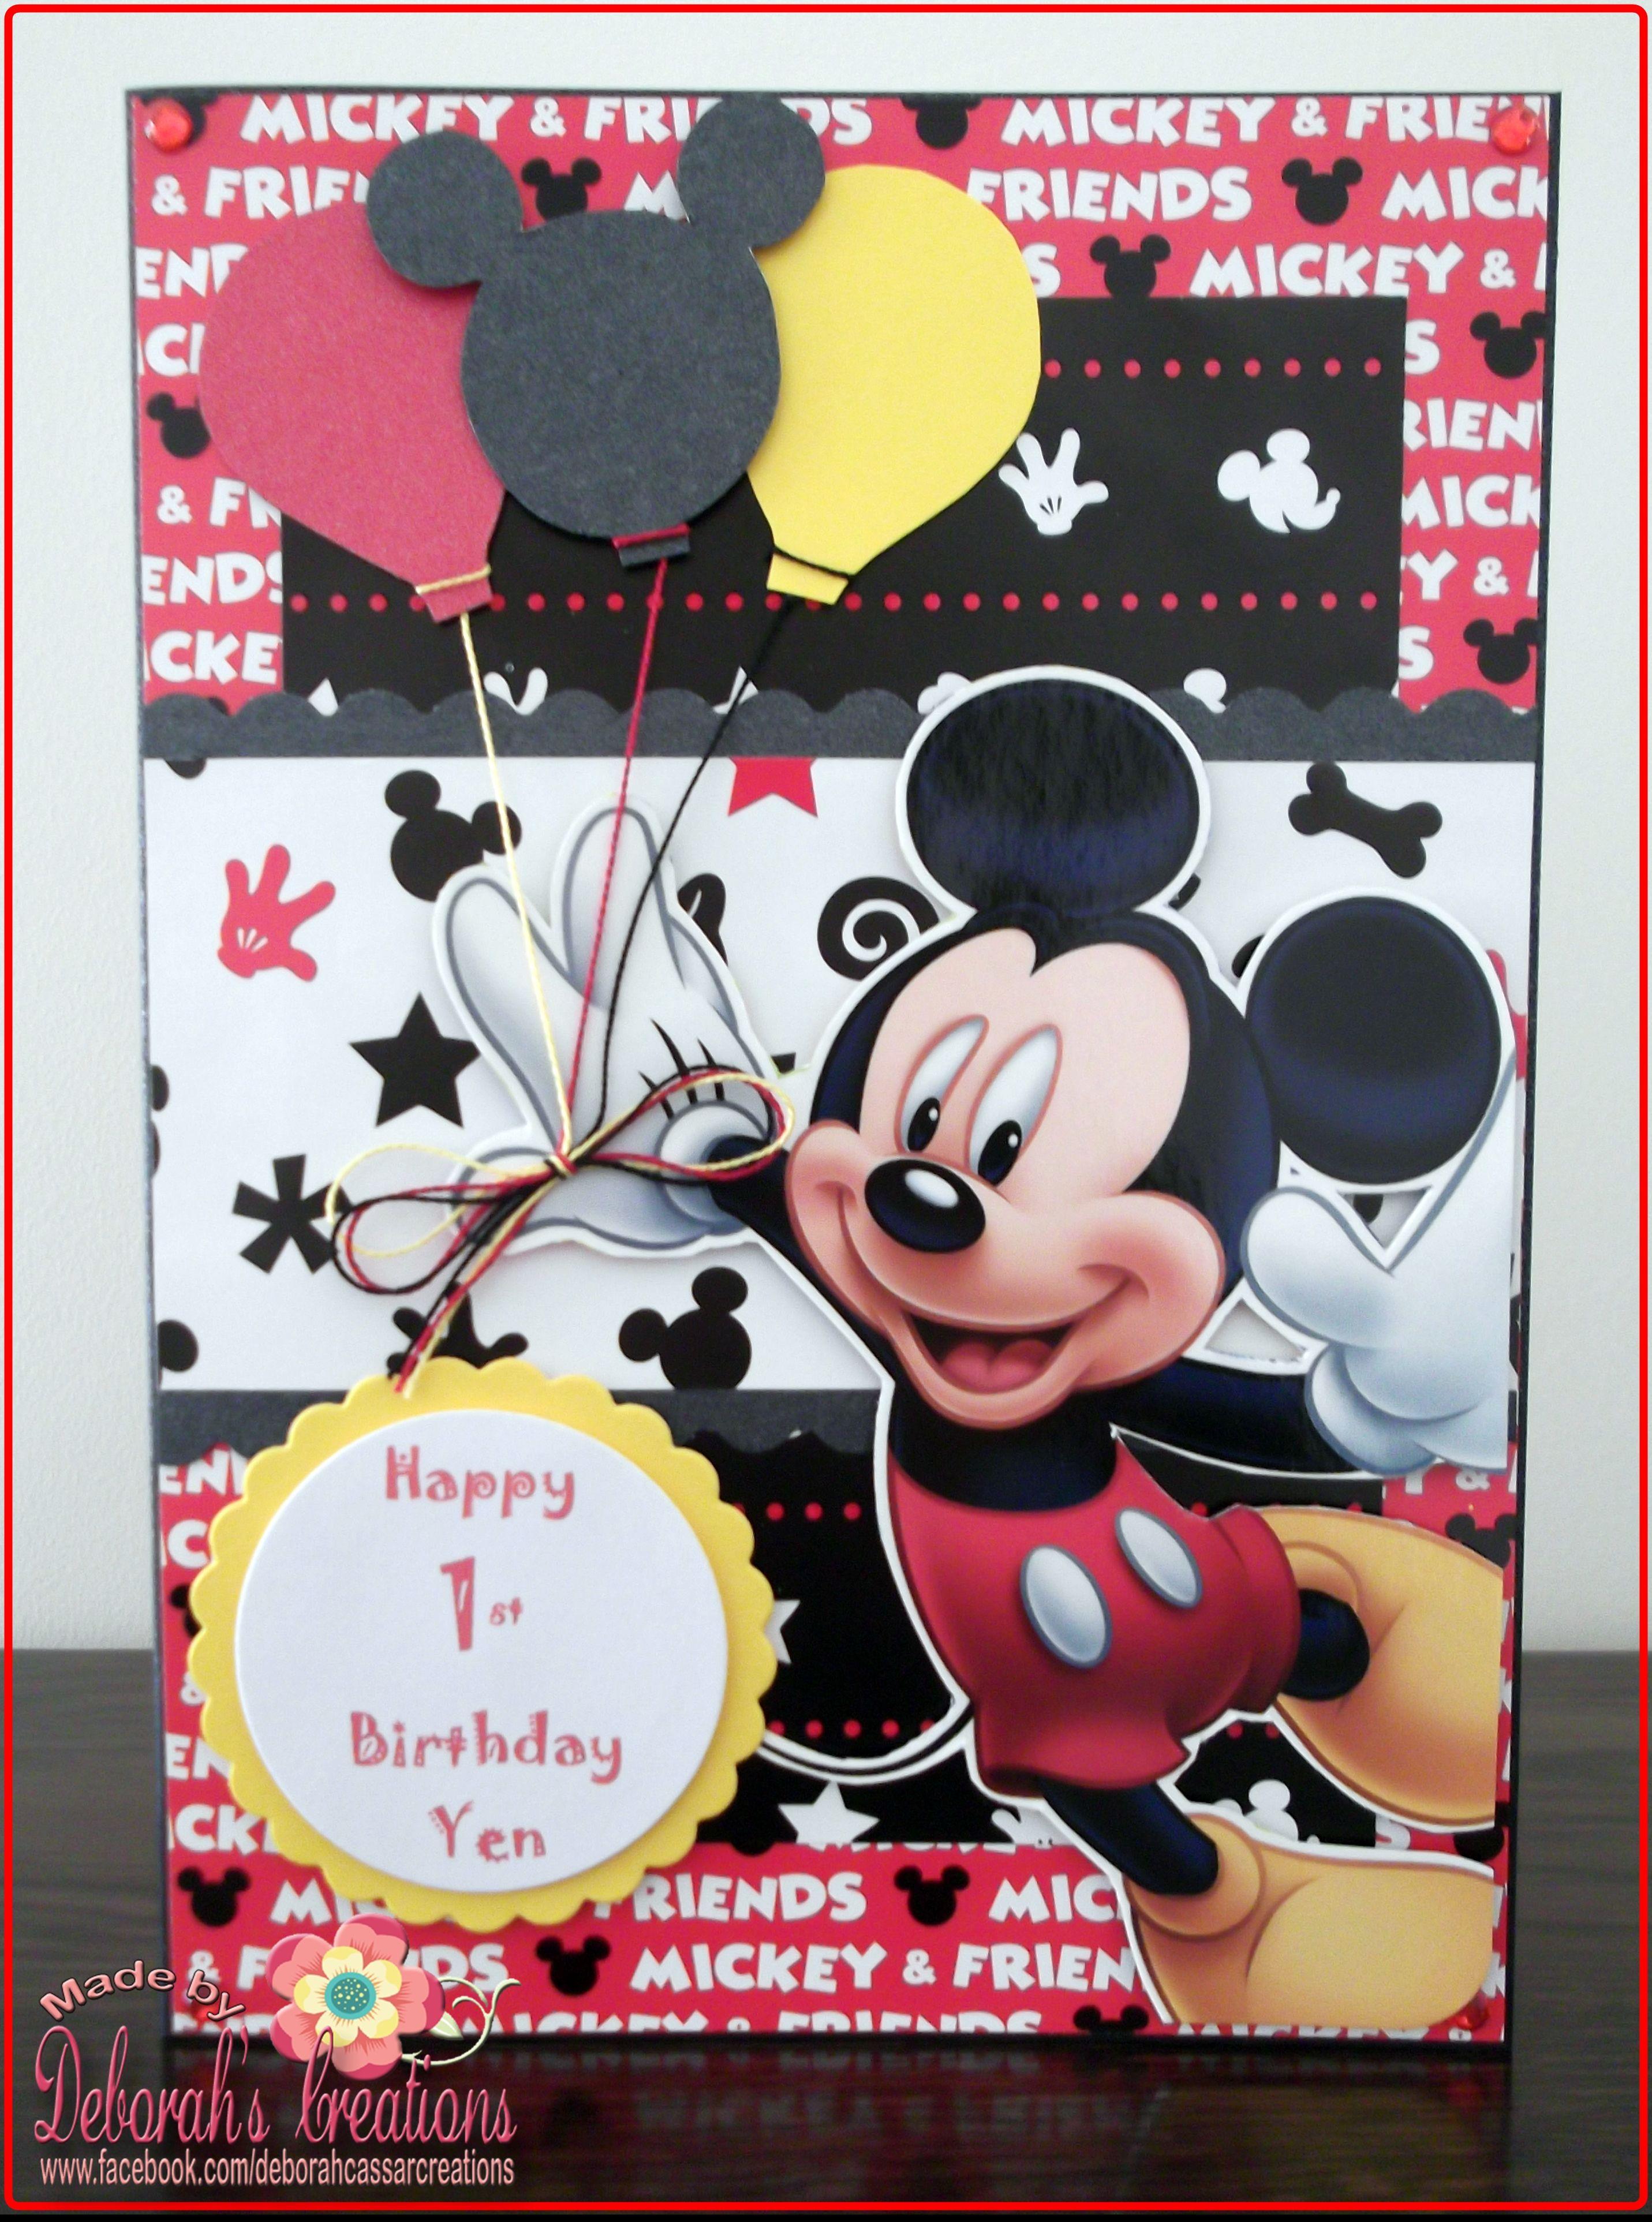 1st Birthday Boy Card With Disney Mickey Mouse Theme Kids Cards Cards Handmade Mickey Mouse Theme